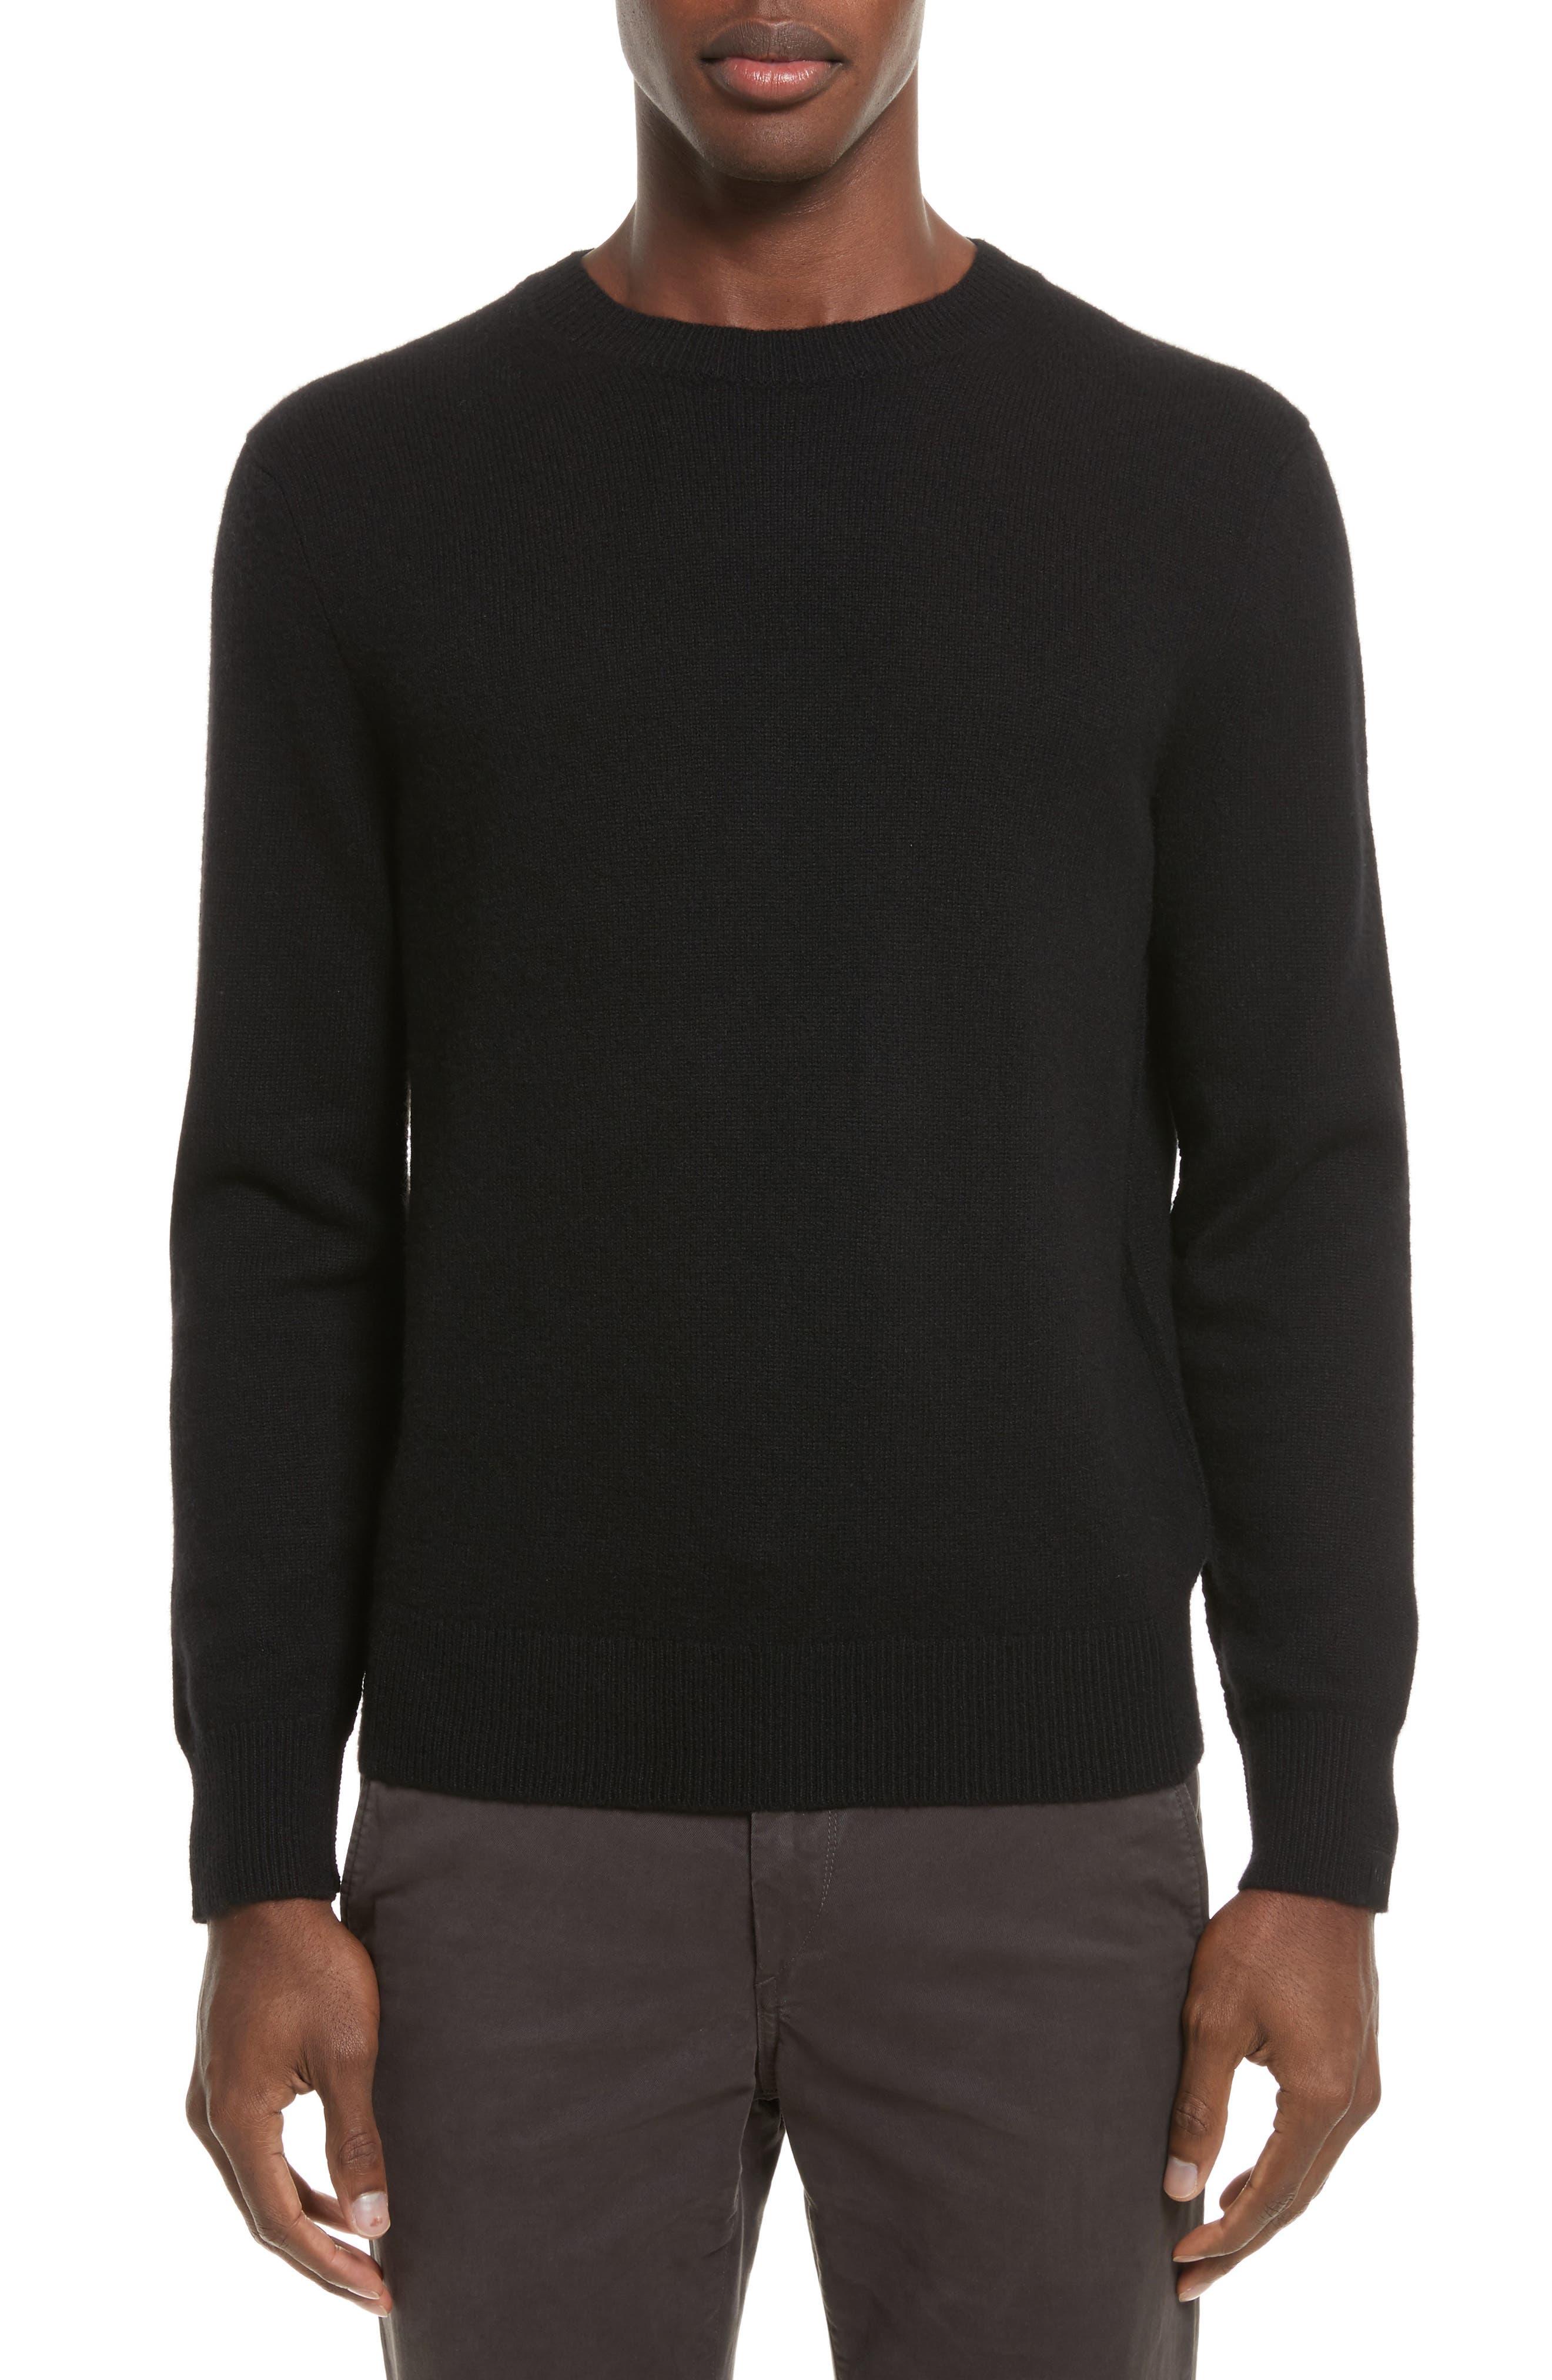 Haldon Cashmere Crewneck Sweatshirt,                         Main,                         color, 001